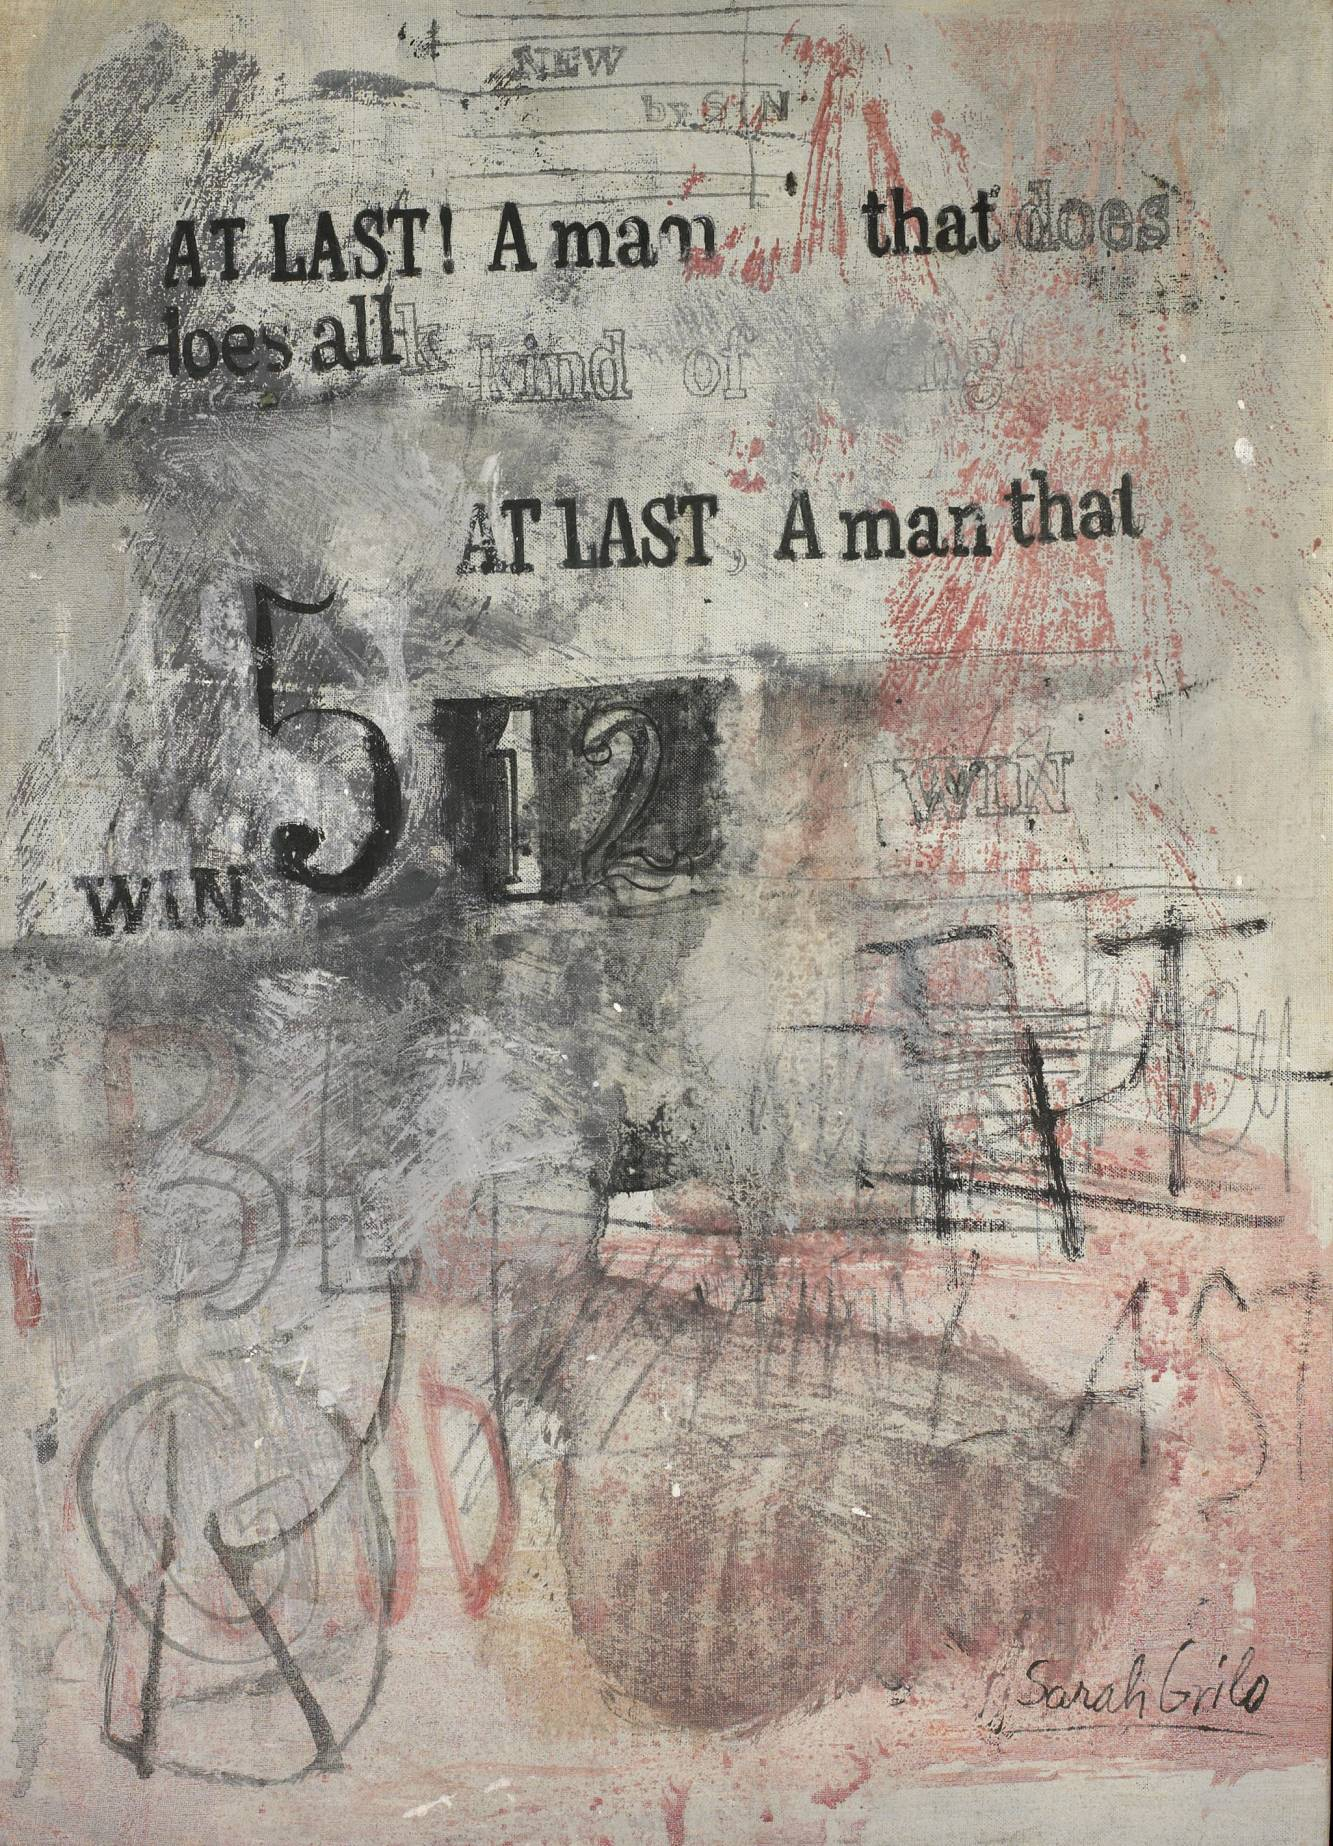 At last a man (1965) - Sarah Grilo